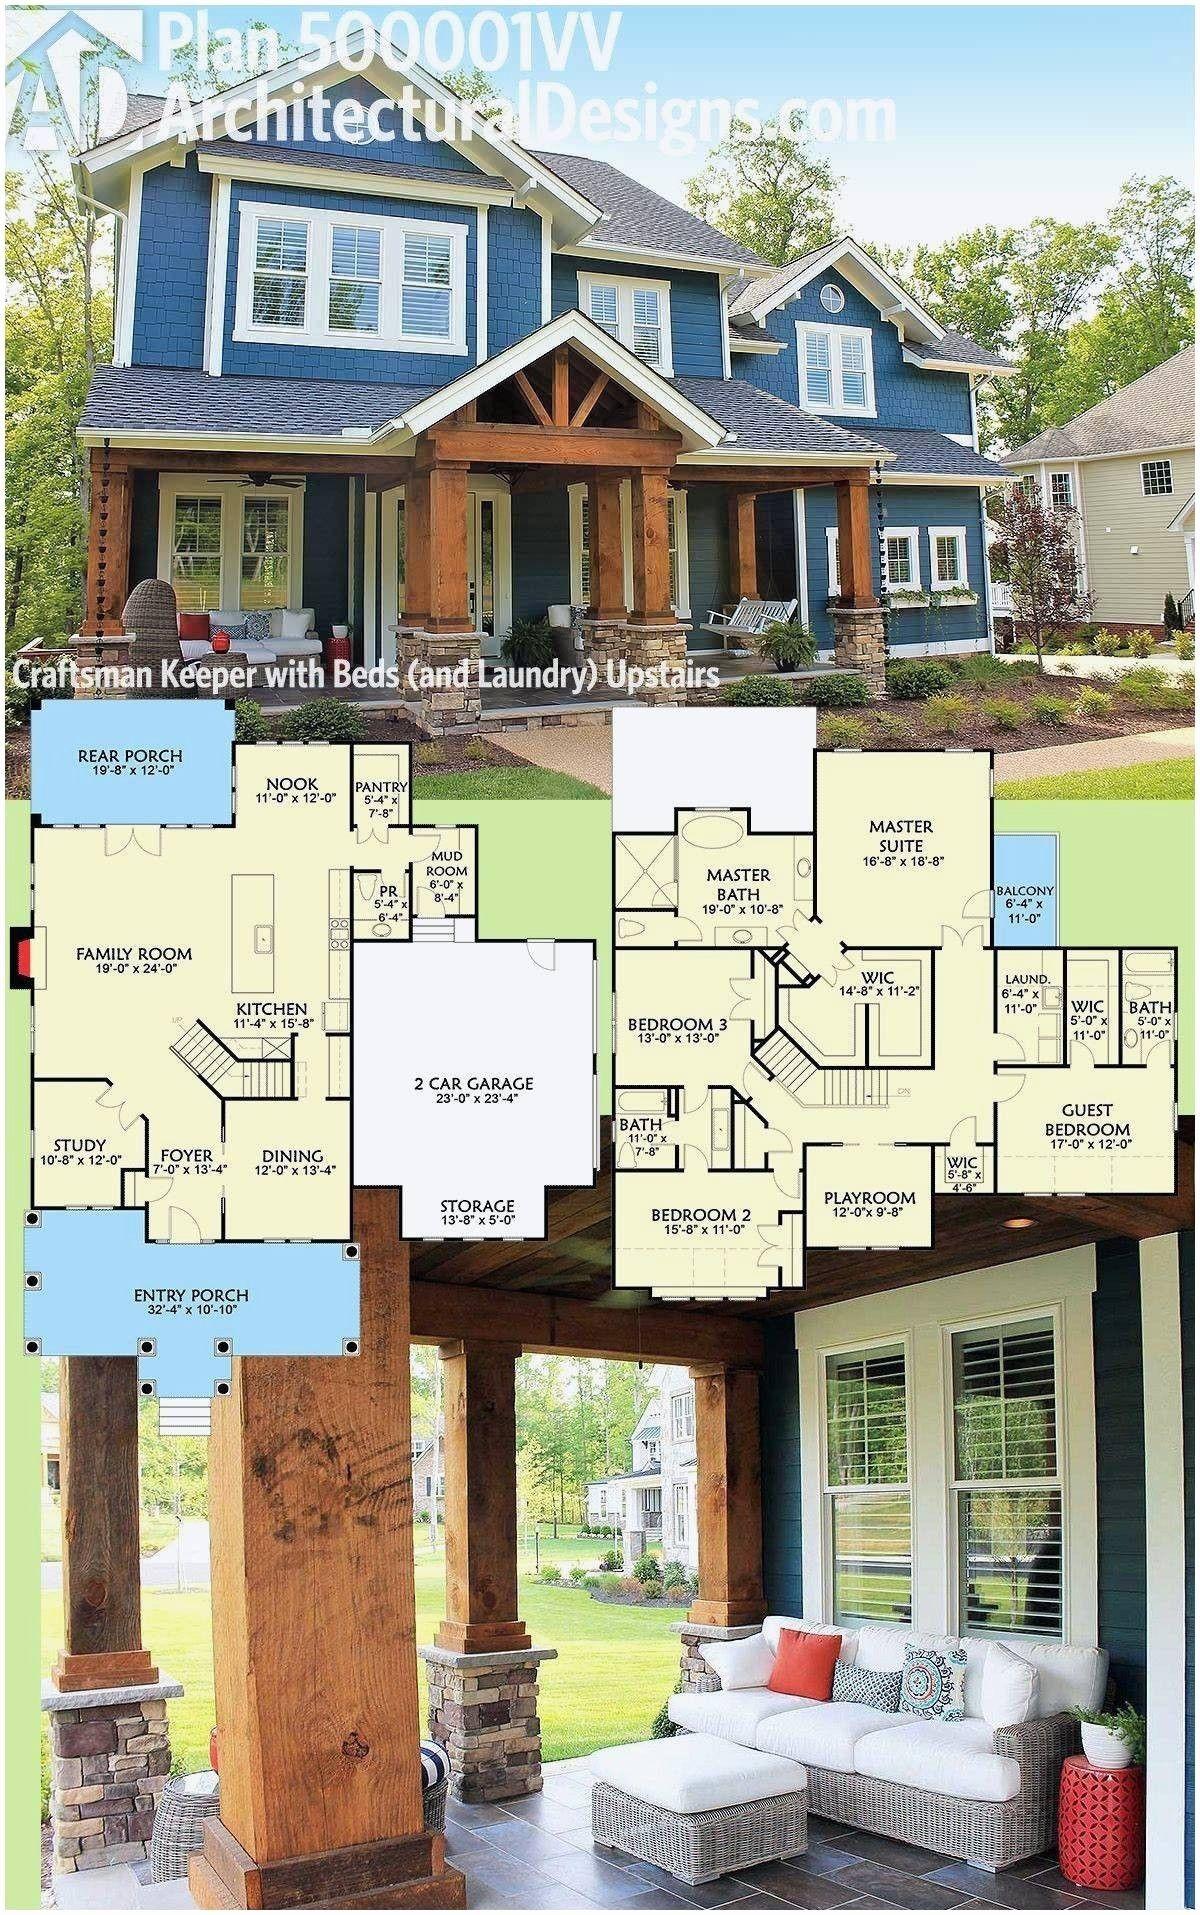 12 7 Bedroom House Plans Homify Best In 2020 Architectural Design House Plans Duplex House Design Craftsman House Plans